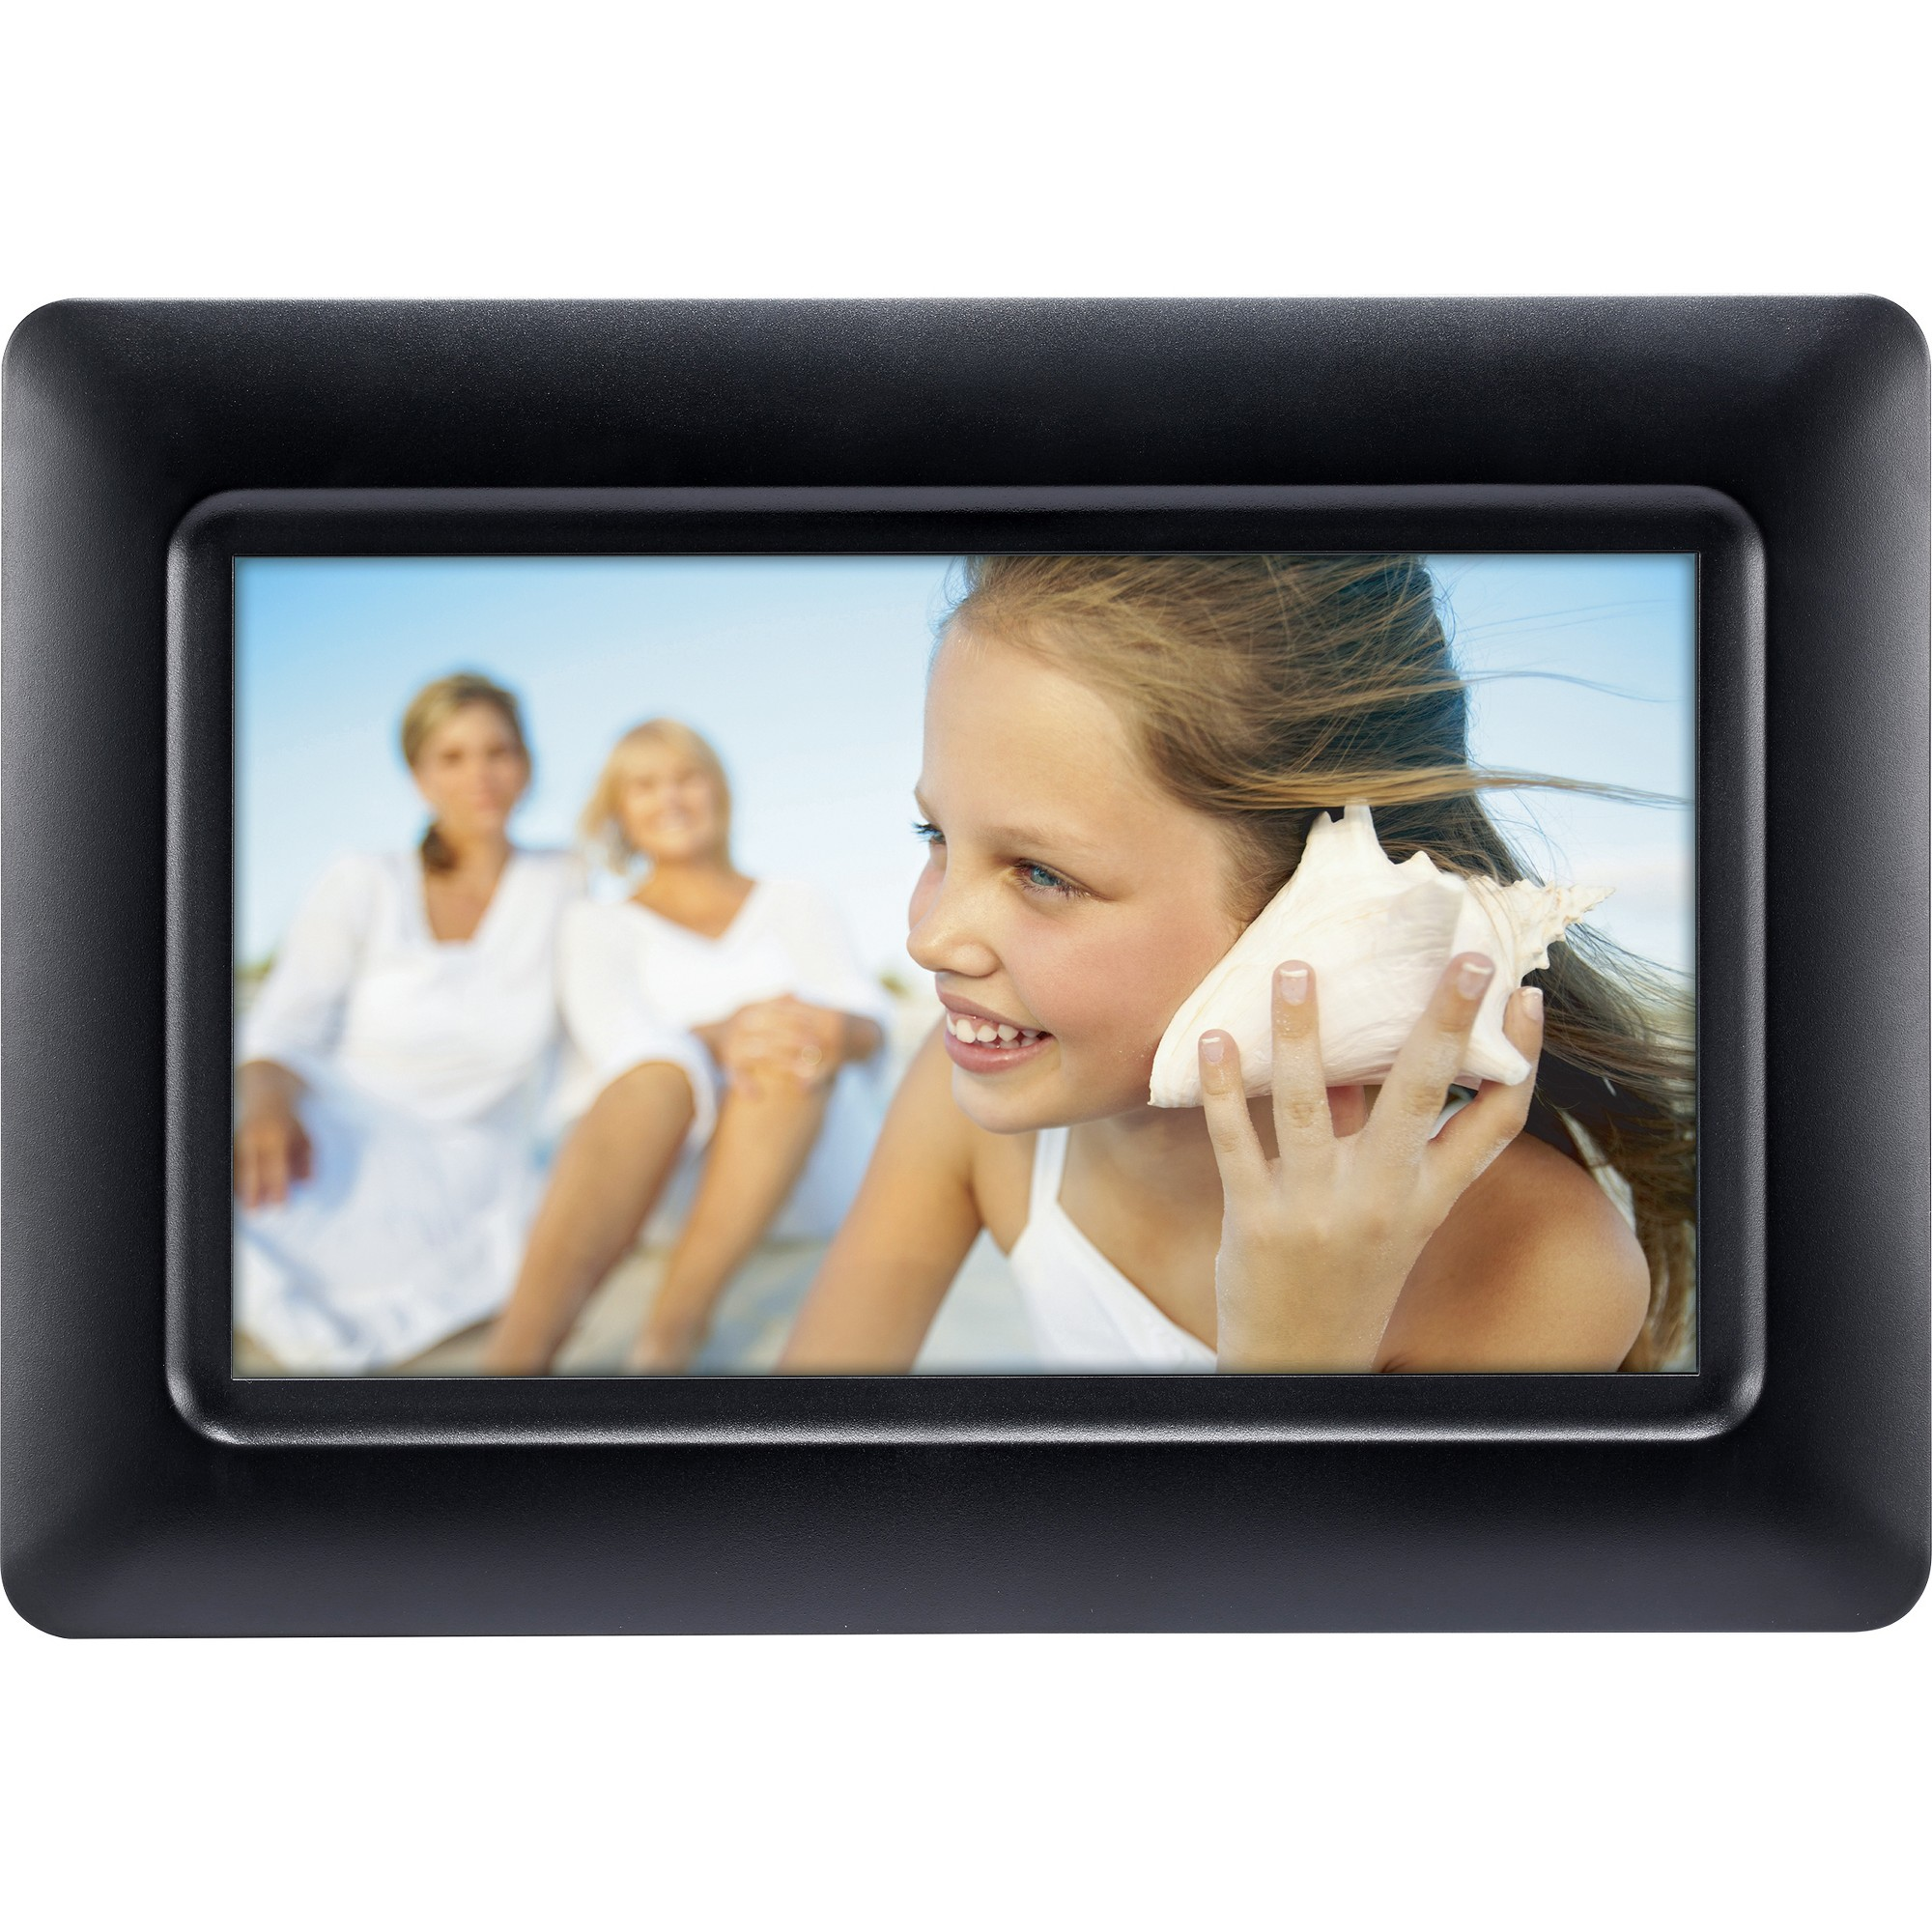 Polaroid Digital Photo Frame 7 Screen - Black | Products | Pinterest ...